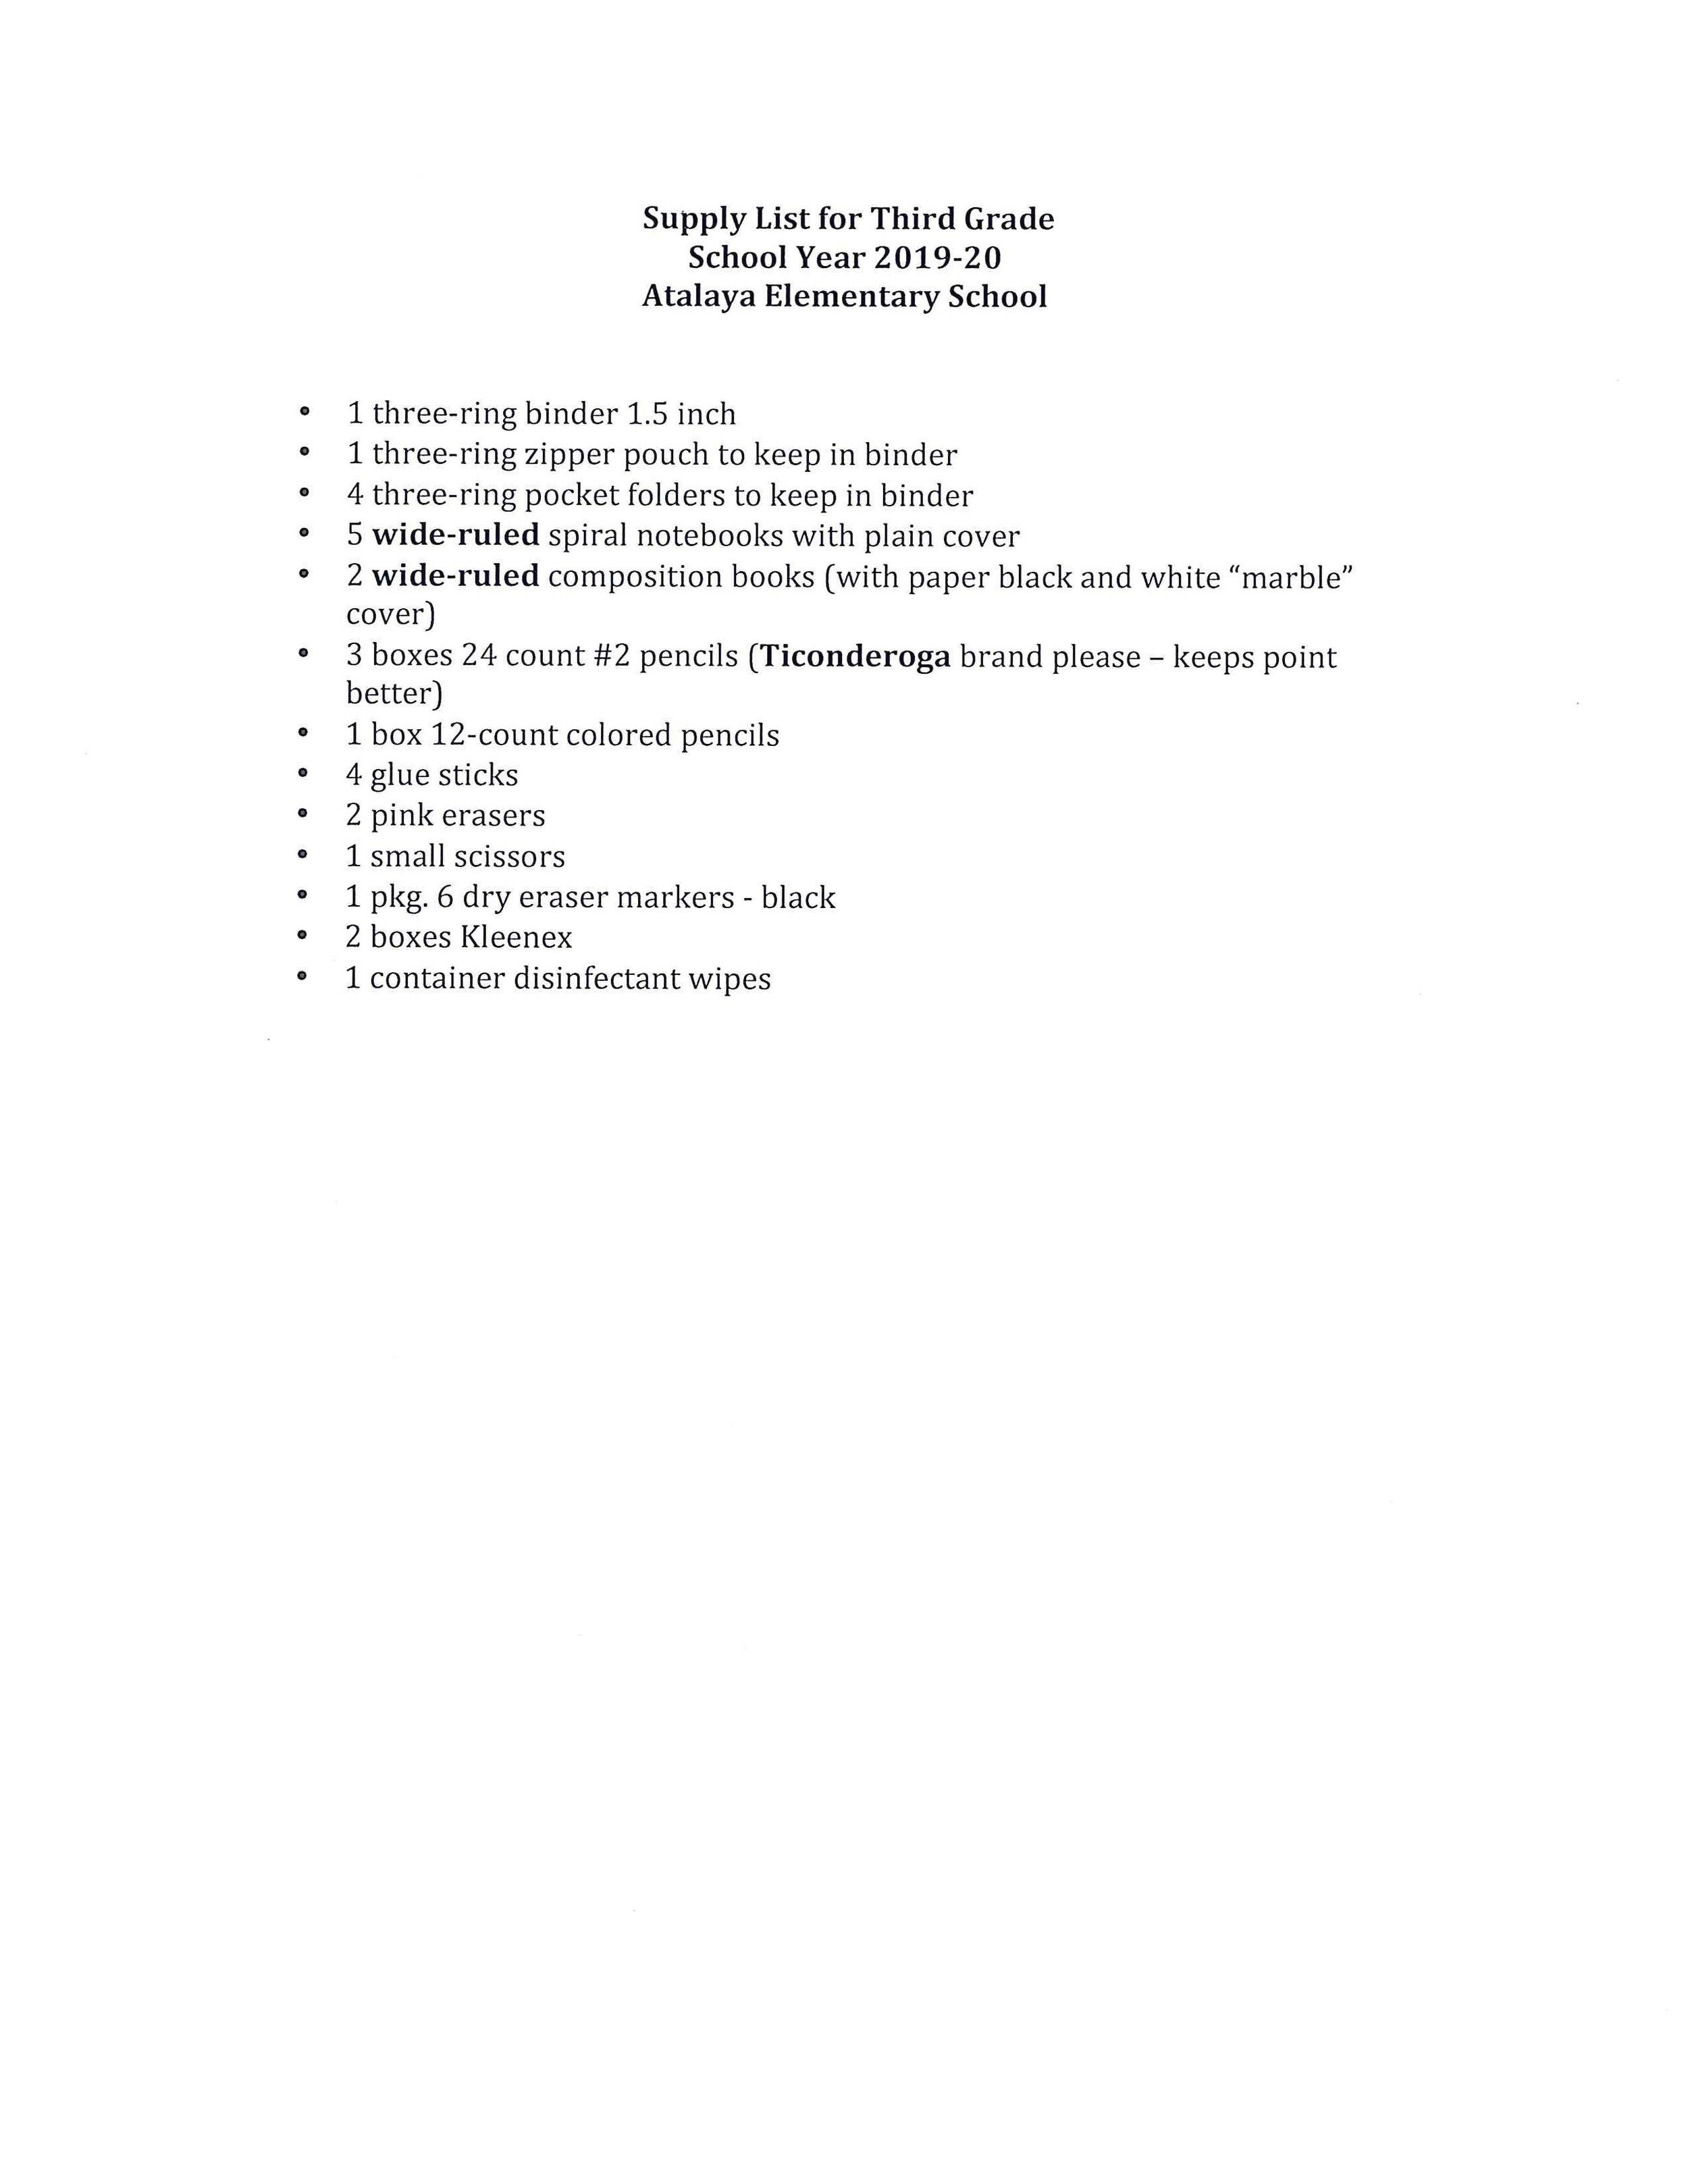 Back to School List 19_20 3rd Grade.jpg